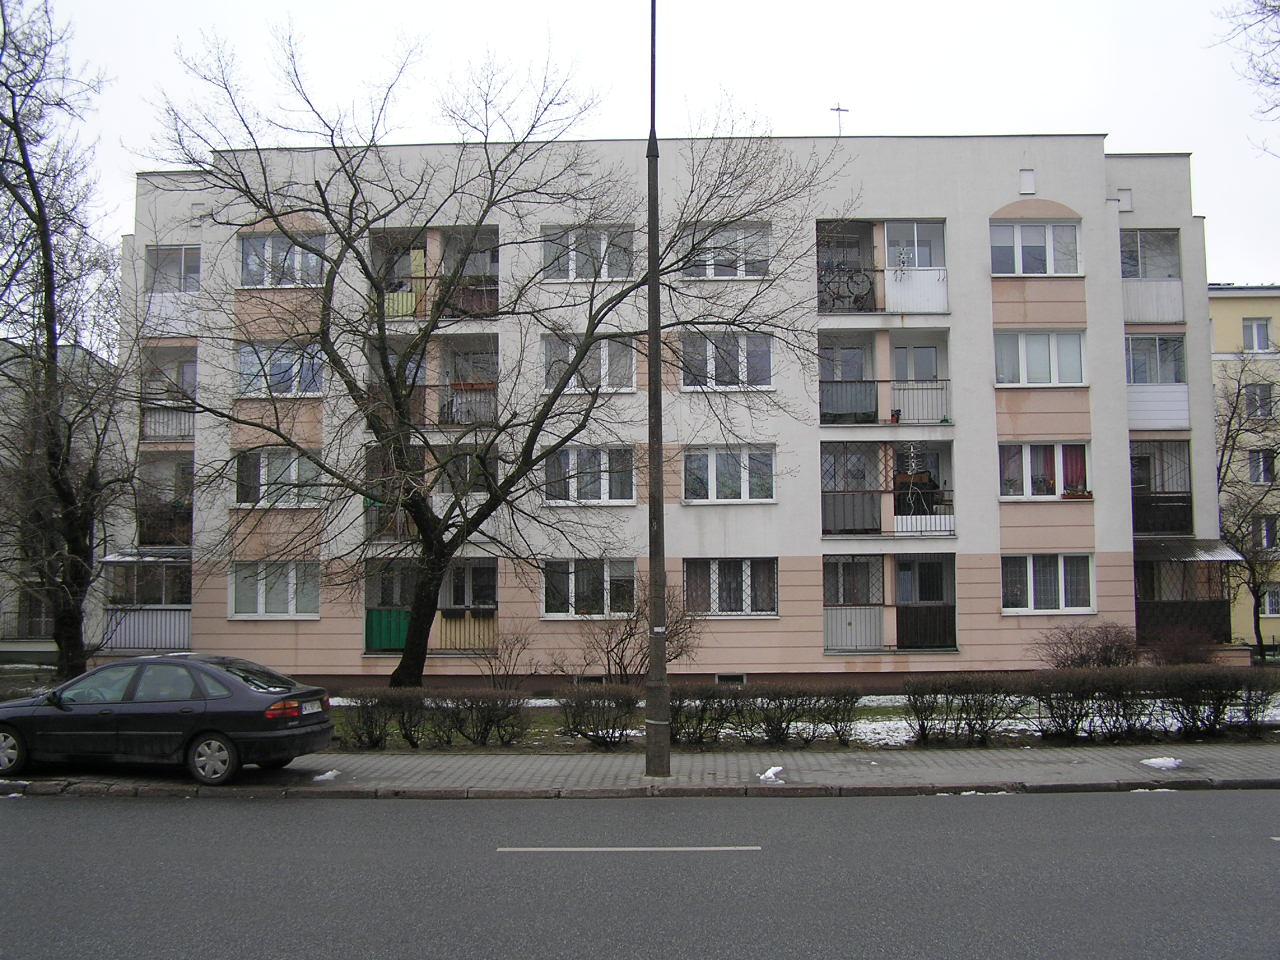 Podskarbińska 10